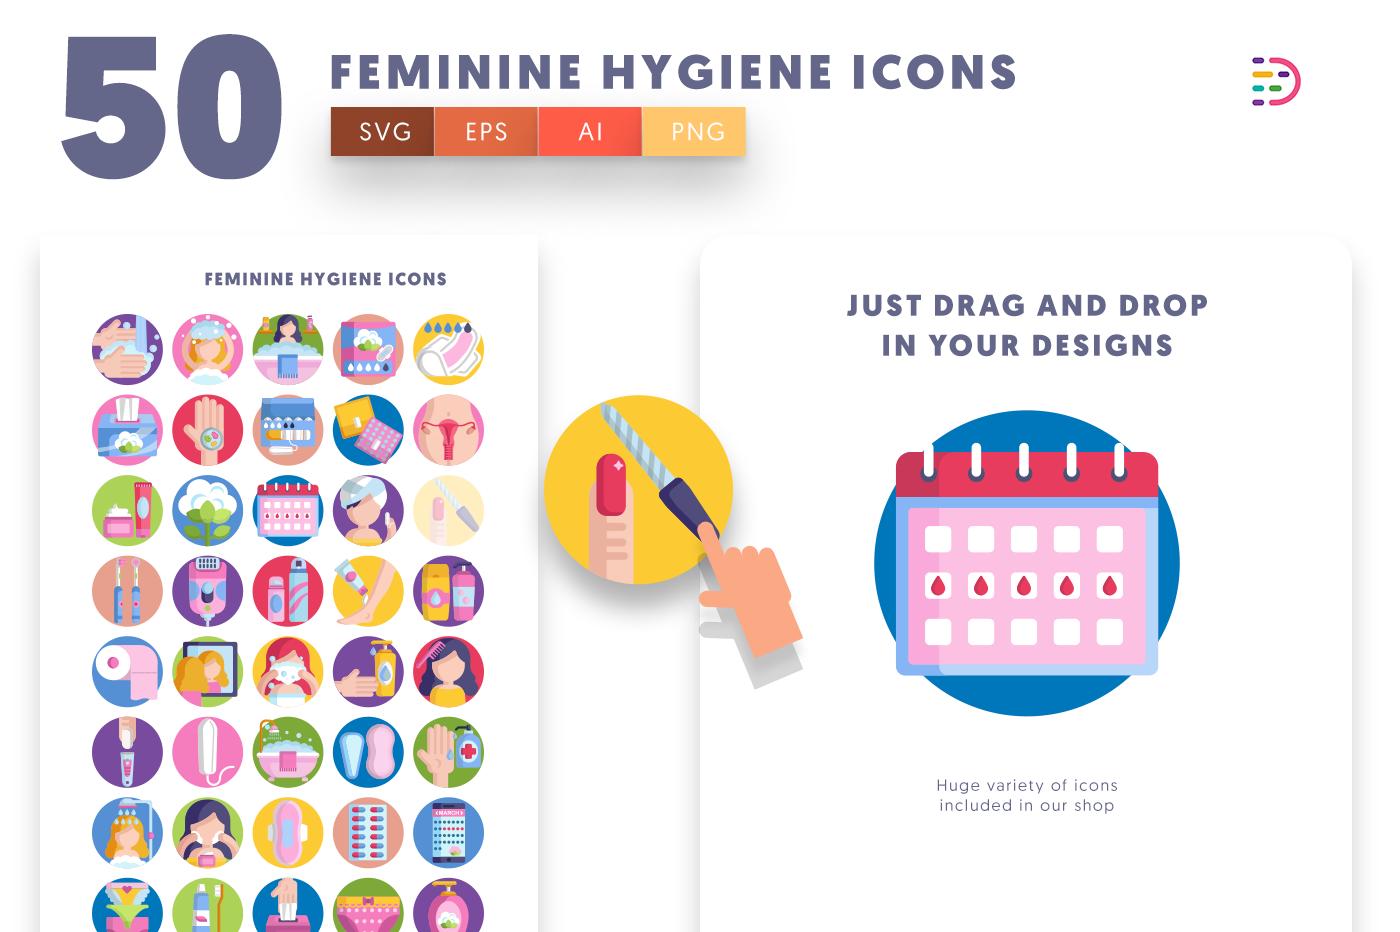 Drag and drop vector 50 Feminine Hygiene Icons